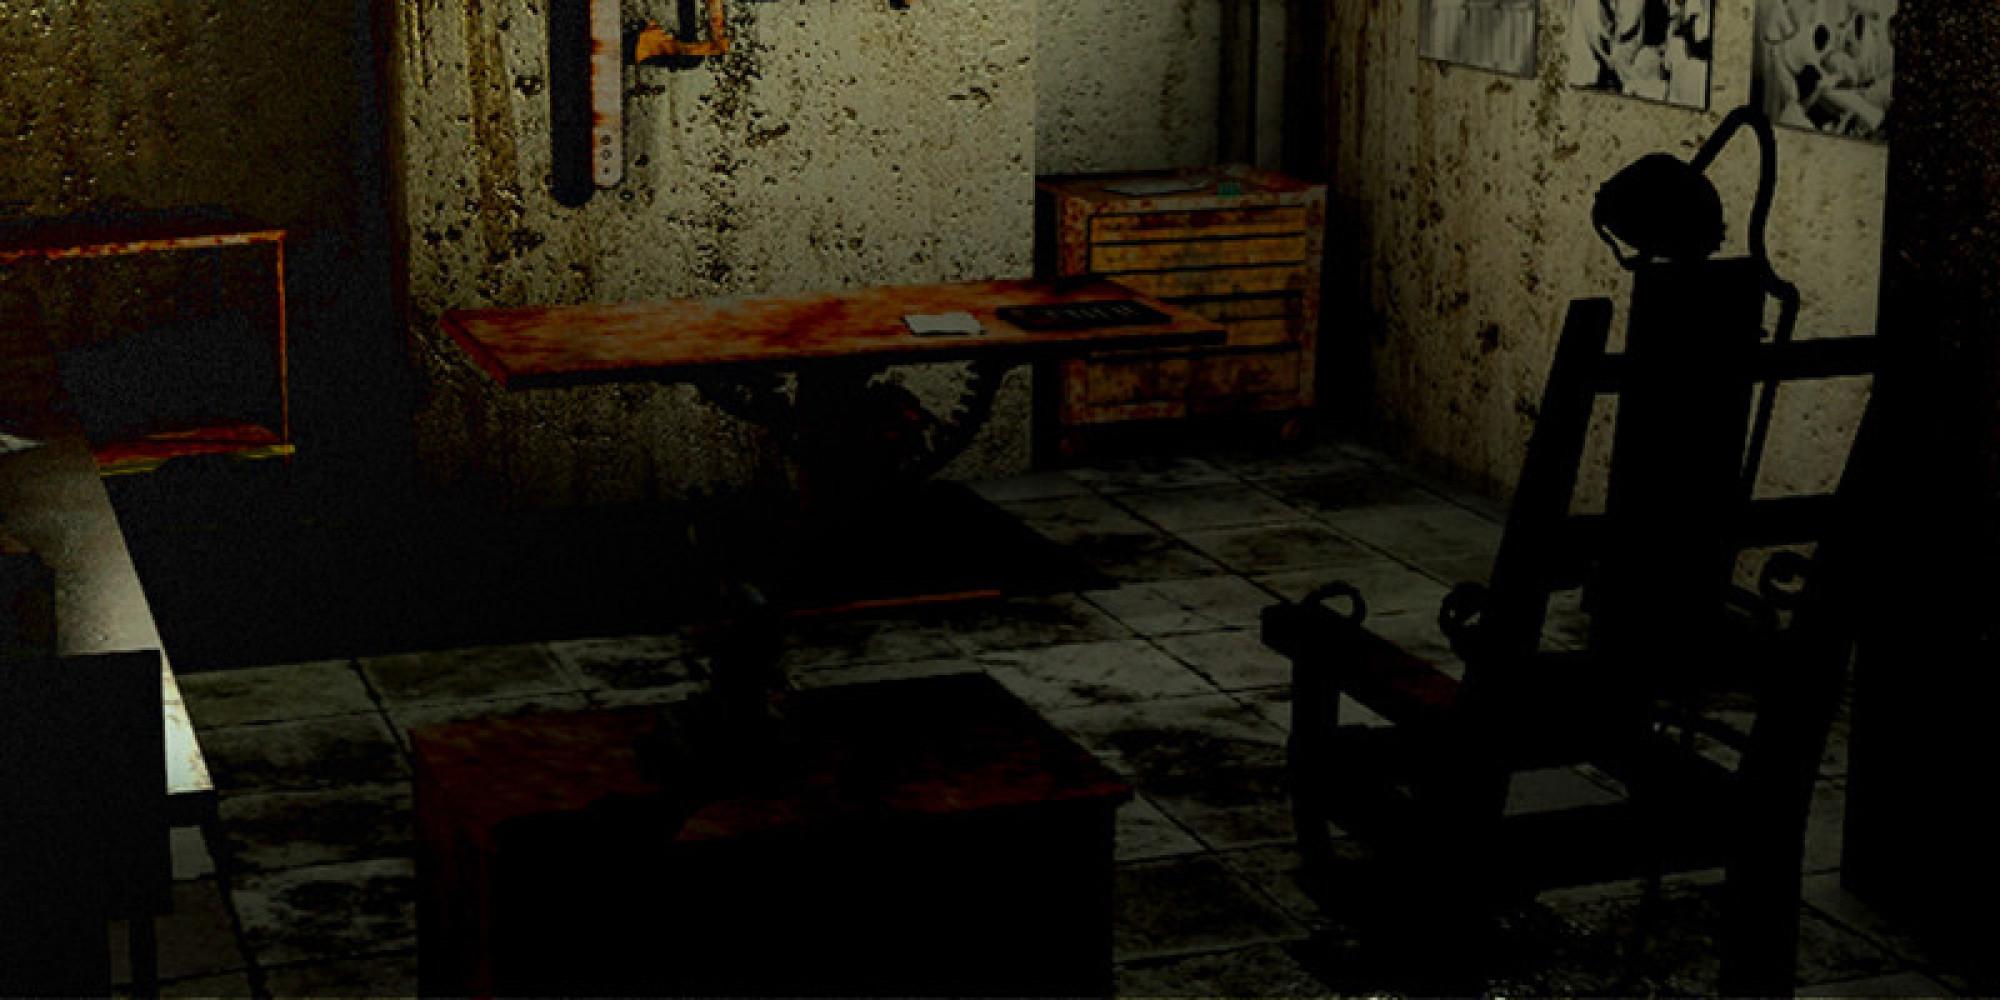 Escape game rooms offer terrifying scenarios for Escape room gadgets